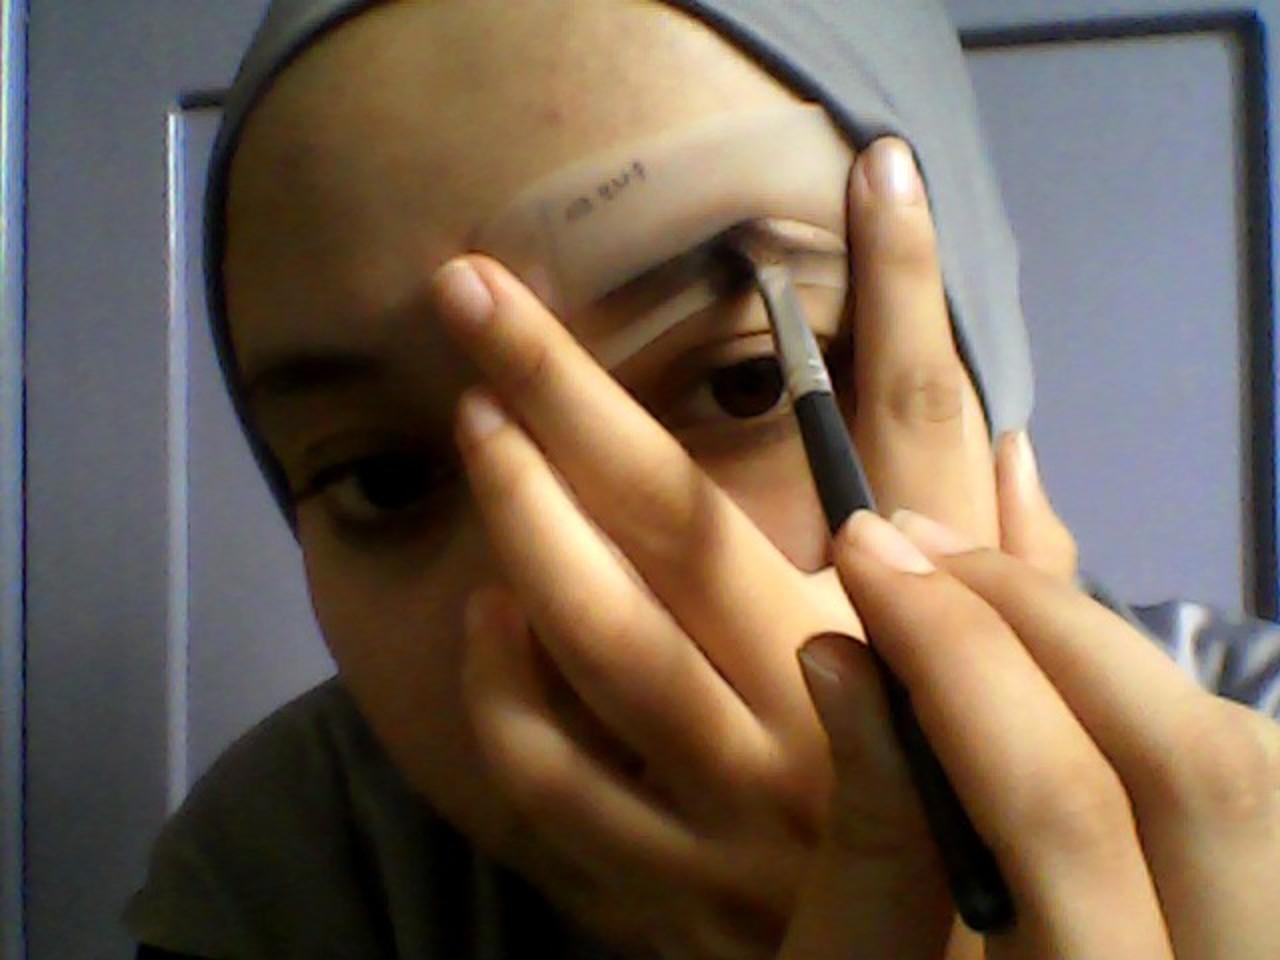 Cara Membuat Alis Tanpa Dicukur Cetakan Kemudian Tempelkan Salah Satu Yang Sesuai Dengan Bentuk Baurkan Eyebrow Menggunakan Brushnya Di Sini Saya